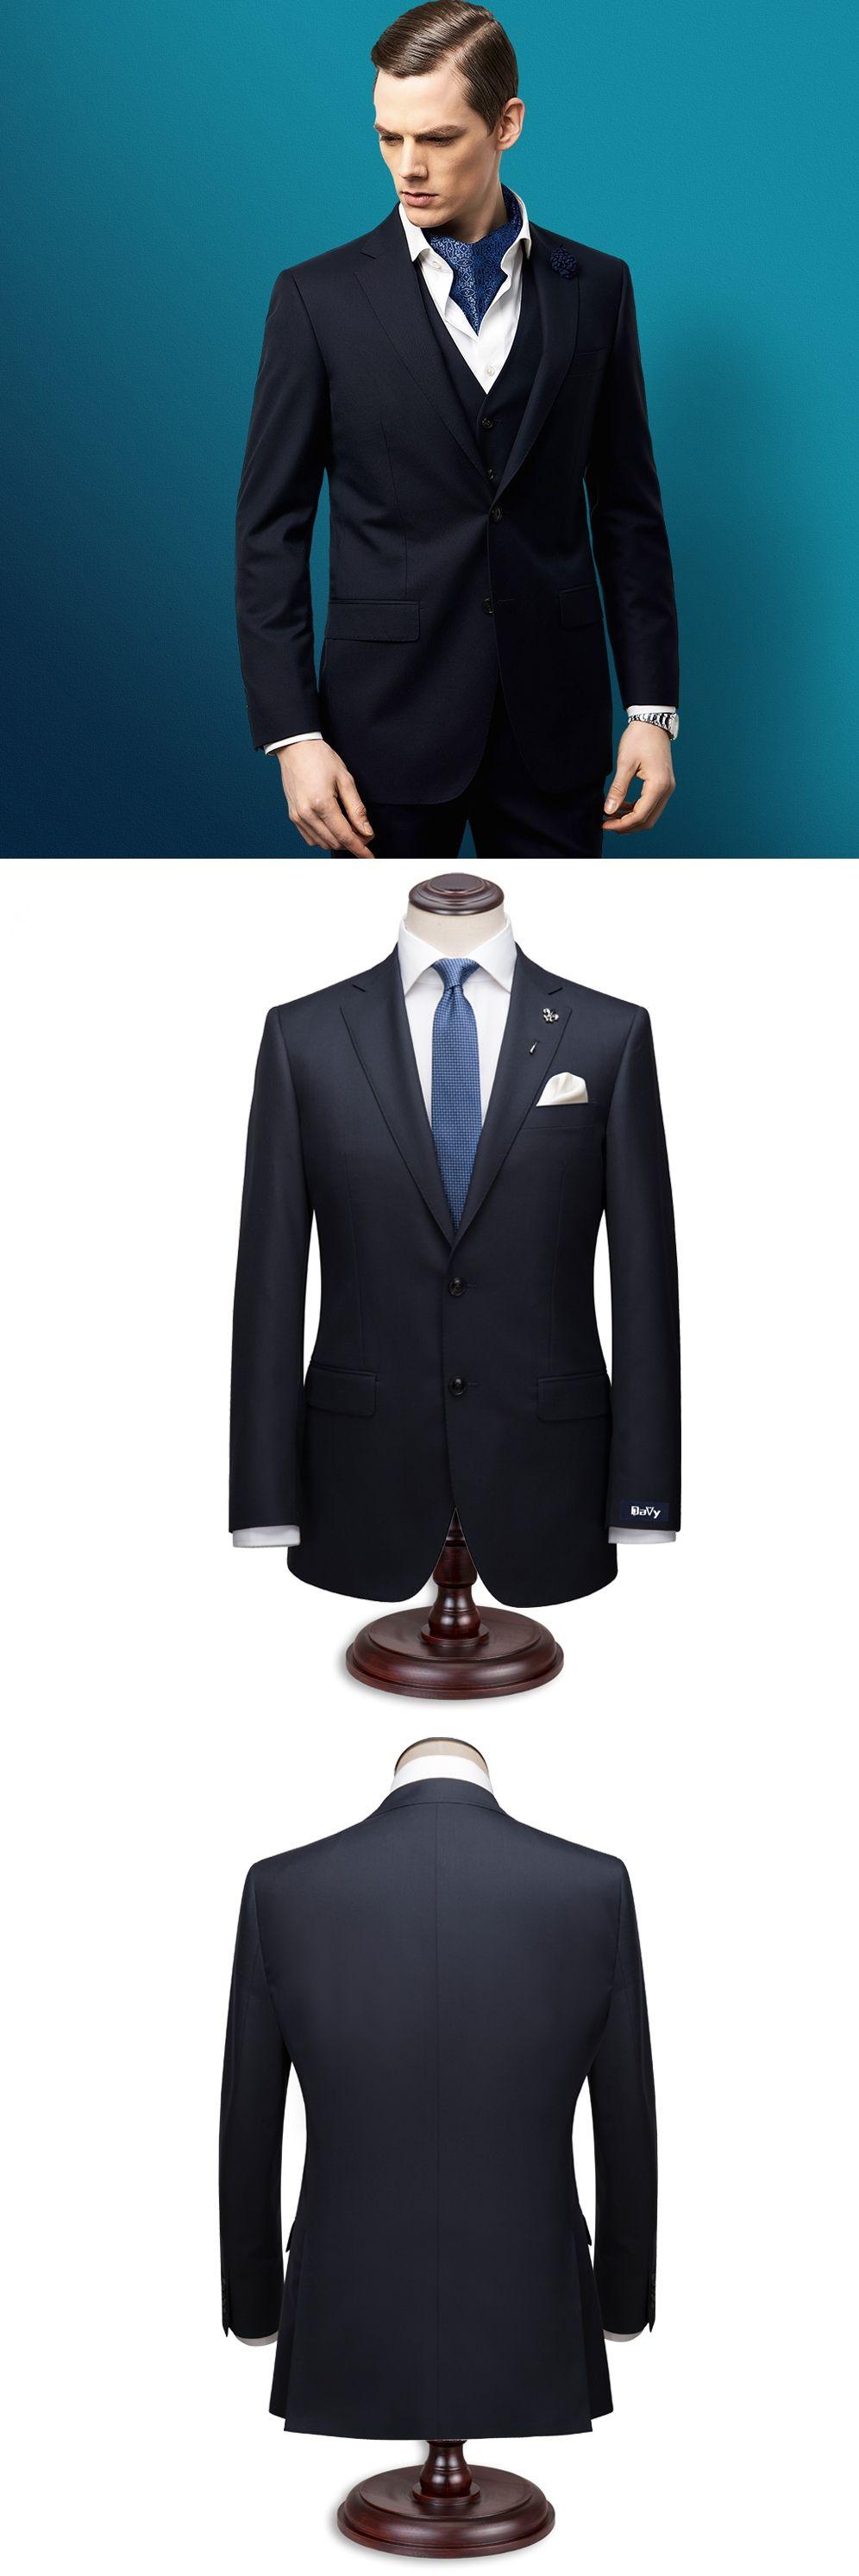 K:1522 Latest Design Mens Suits Groom Tuxedos Groomsmen Wedding Party Dinner Best Man Suits Blazer jacket+pants+girdle+tie